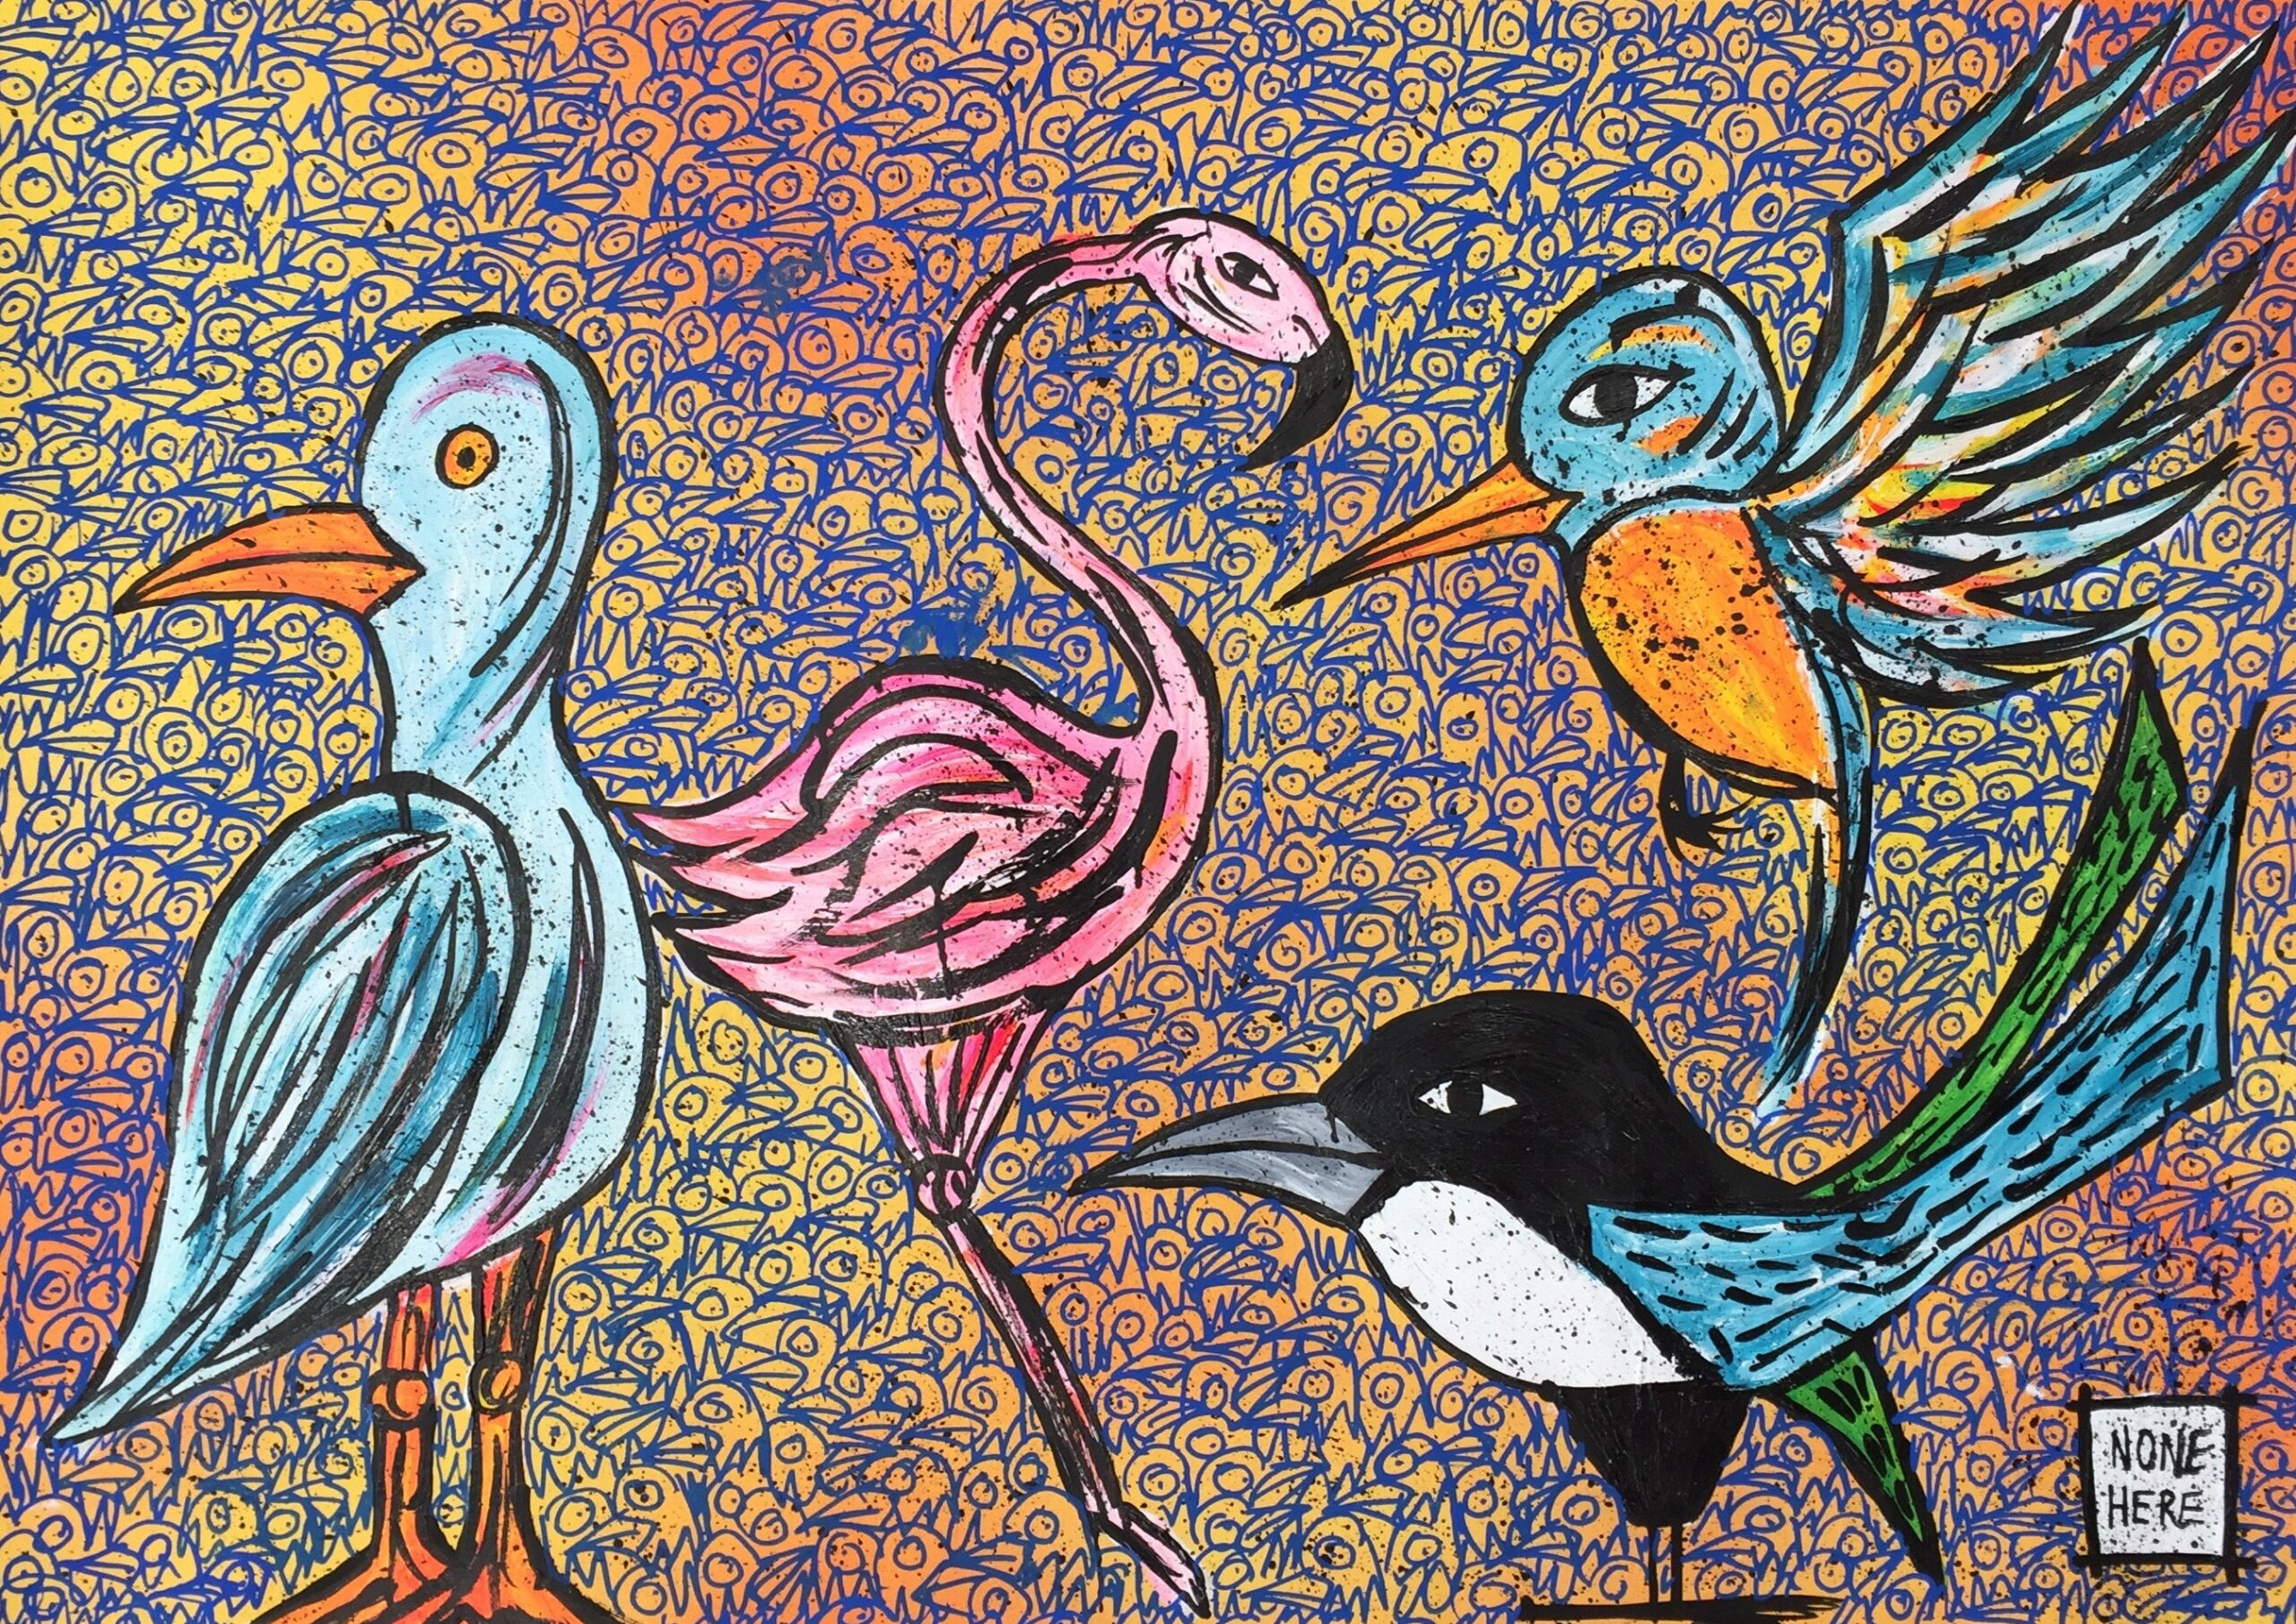 Street art by Steve McCracken featuring colourful birds